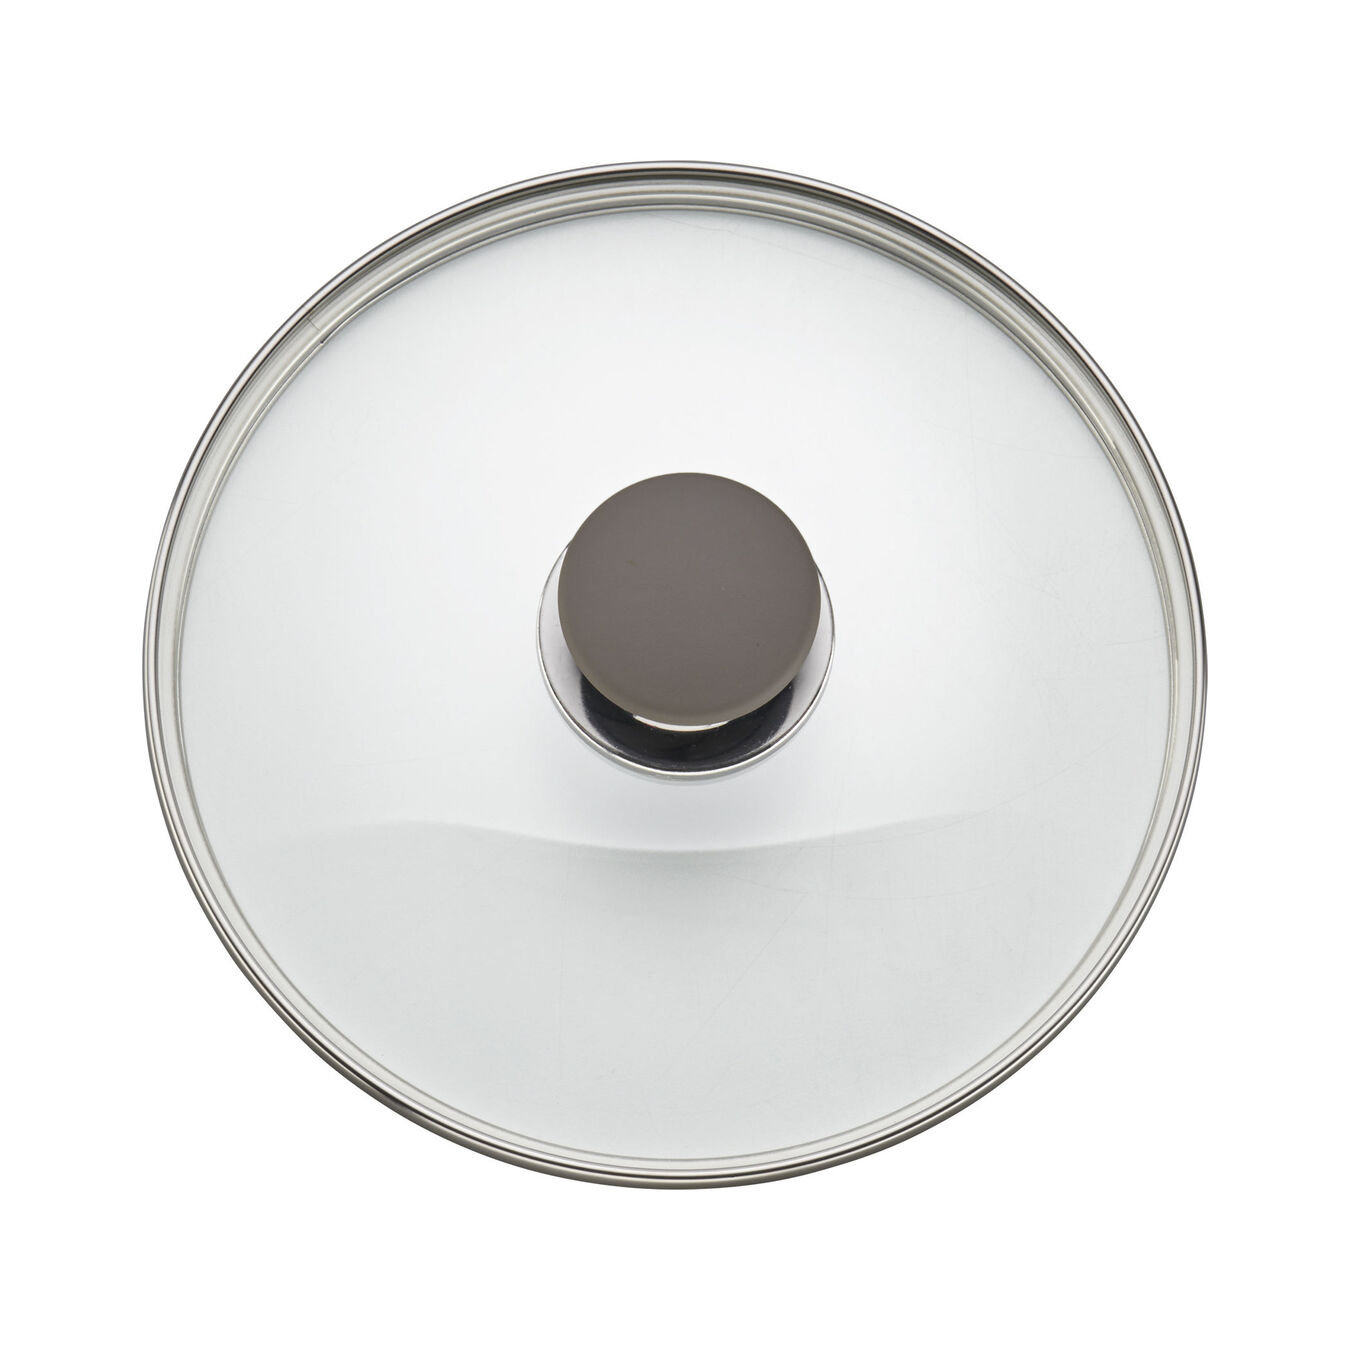 2.8-qt Nonstick Saucepan with Lid,,large 5